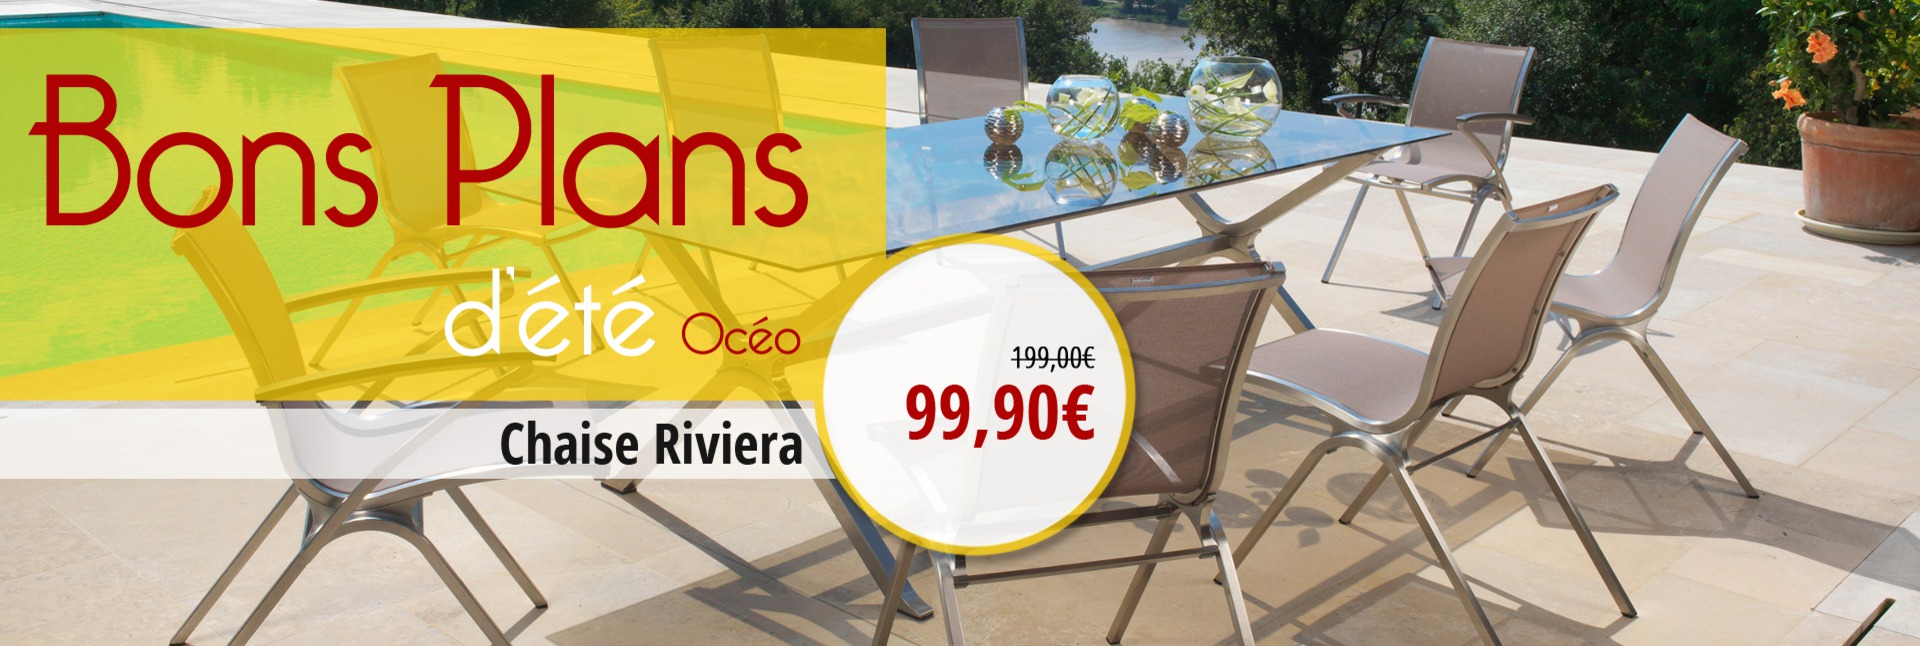 Chaise Riviera